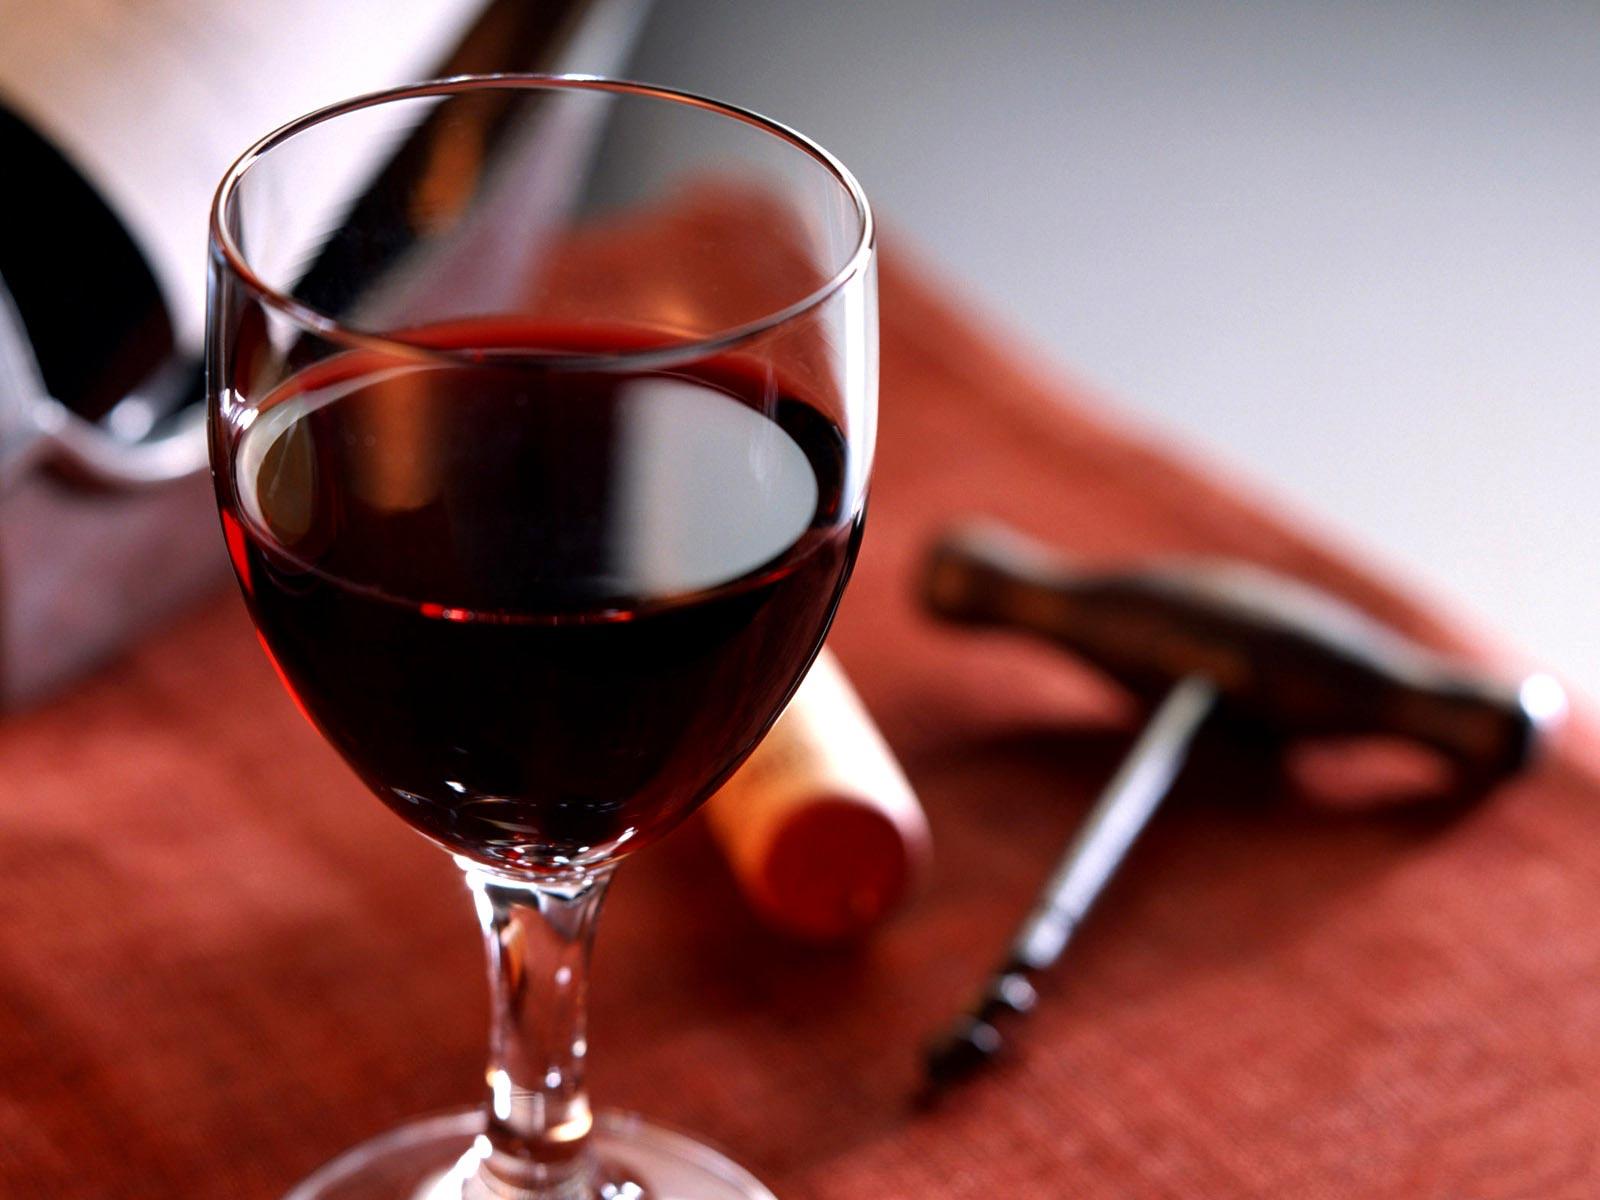 Jūs išgeriate taurę vyno prieš miegą